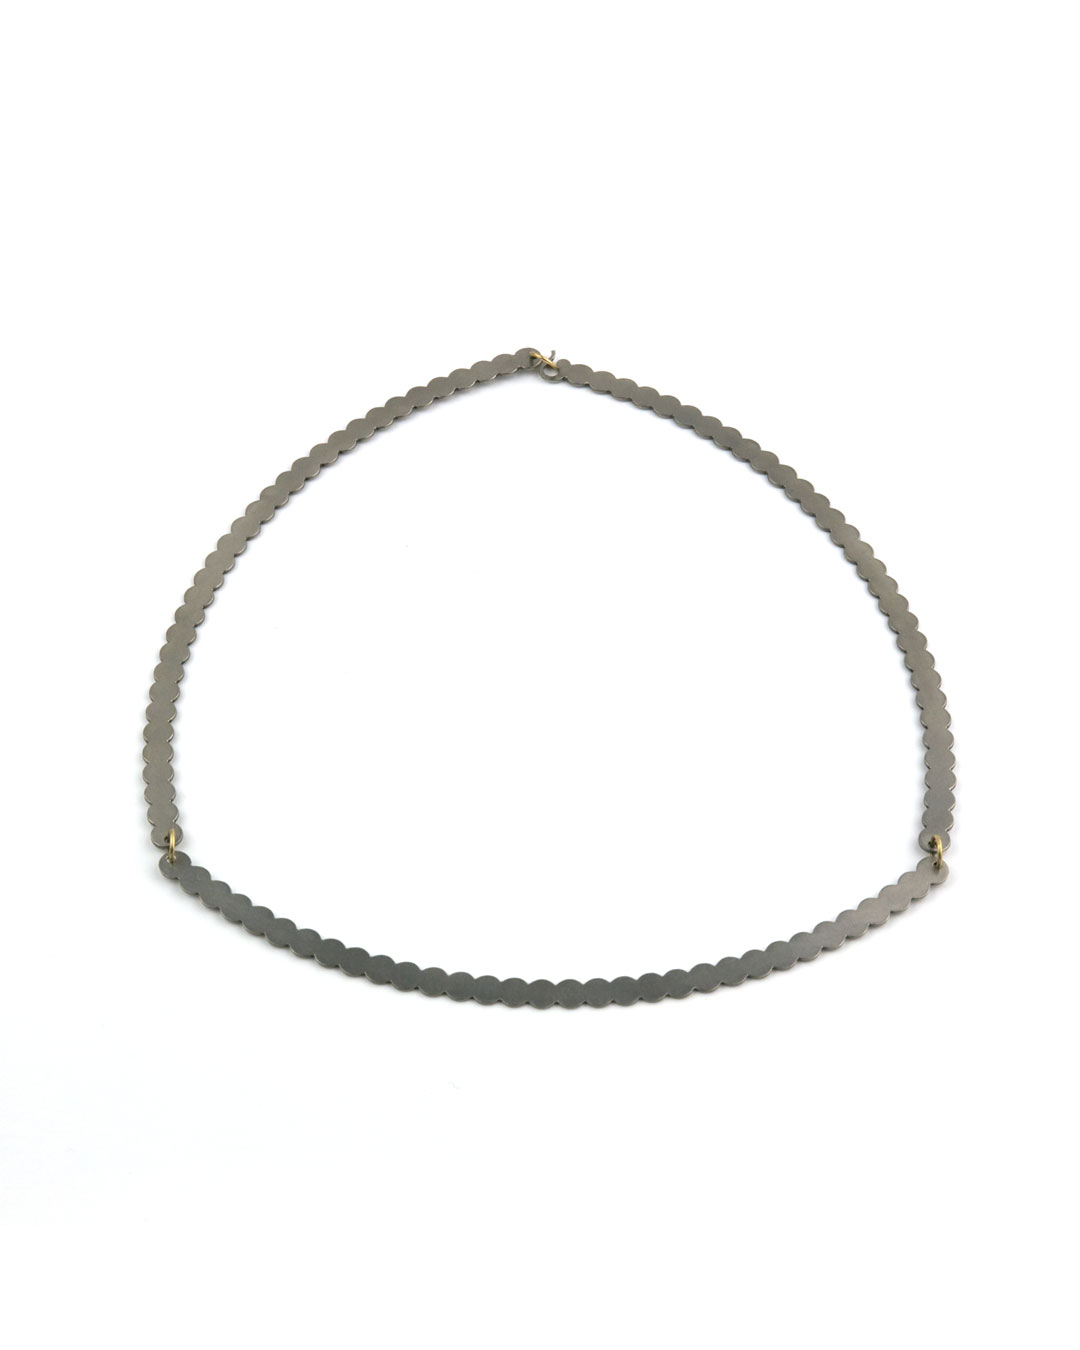 Karola Torkos, Modula, 2007, necklace; stainless steel, 8ct gold, ø 180 mm, €715